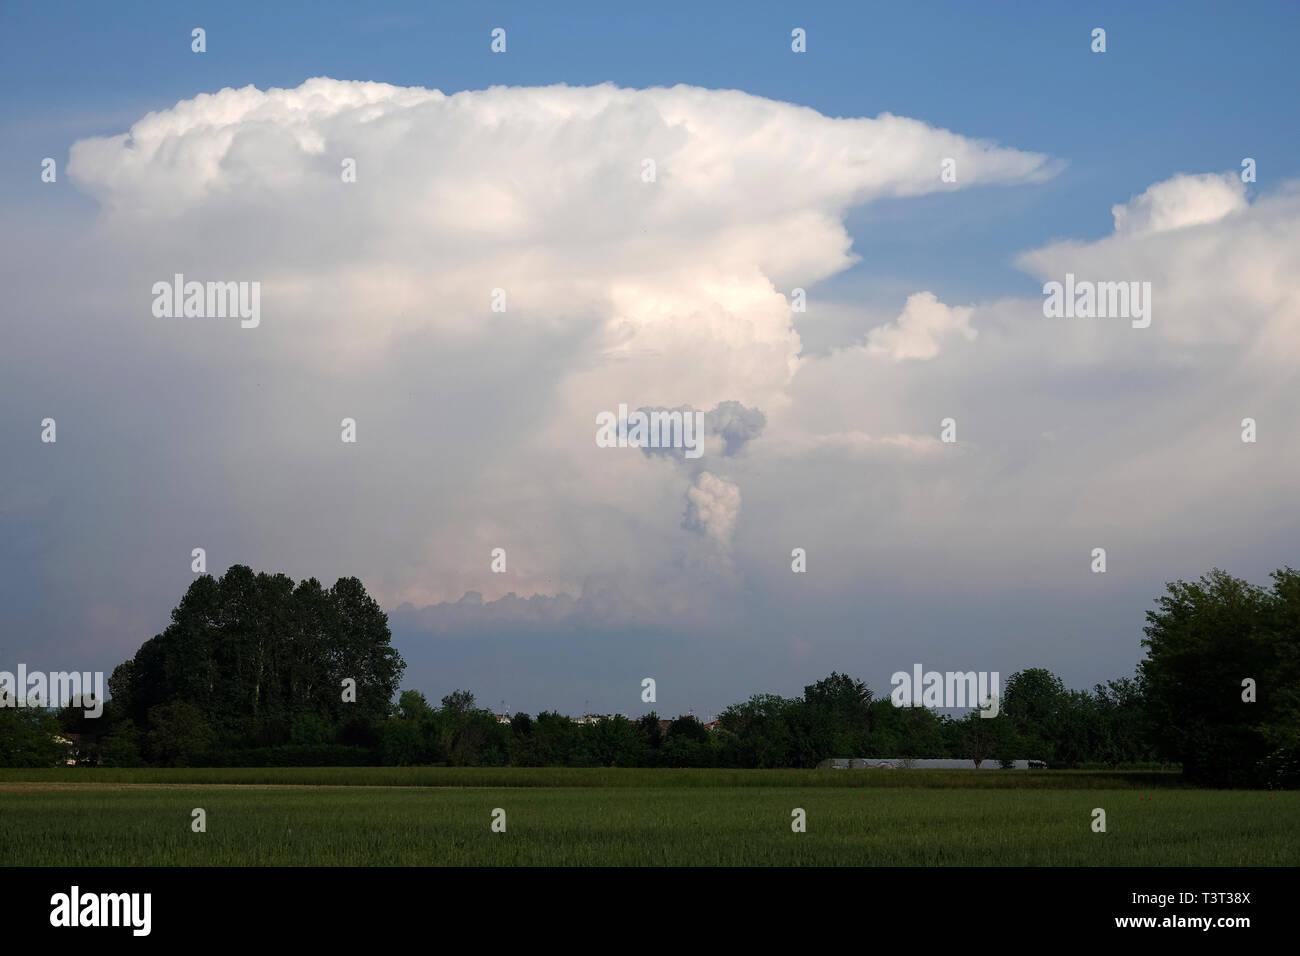 cumulonimbus, thunderstorm cloud over the plain - Stock Image